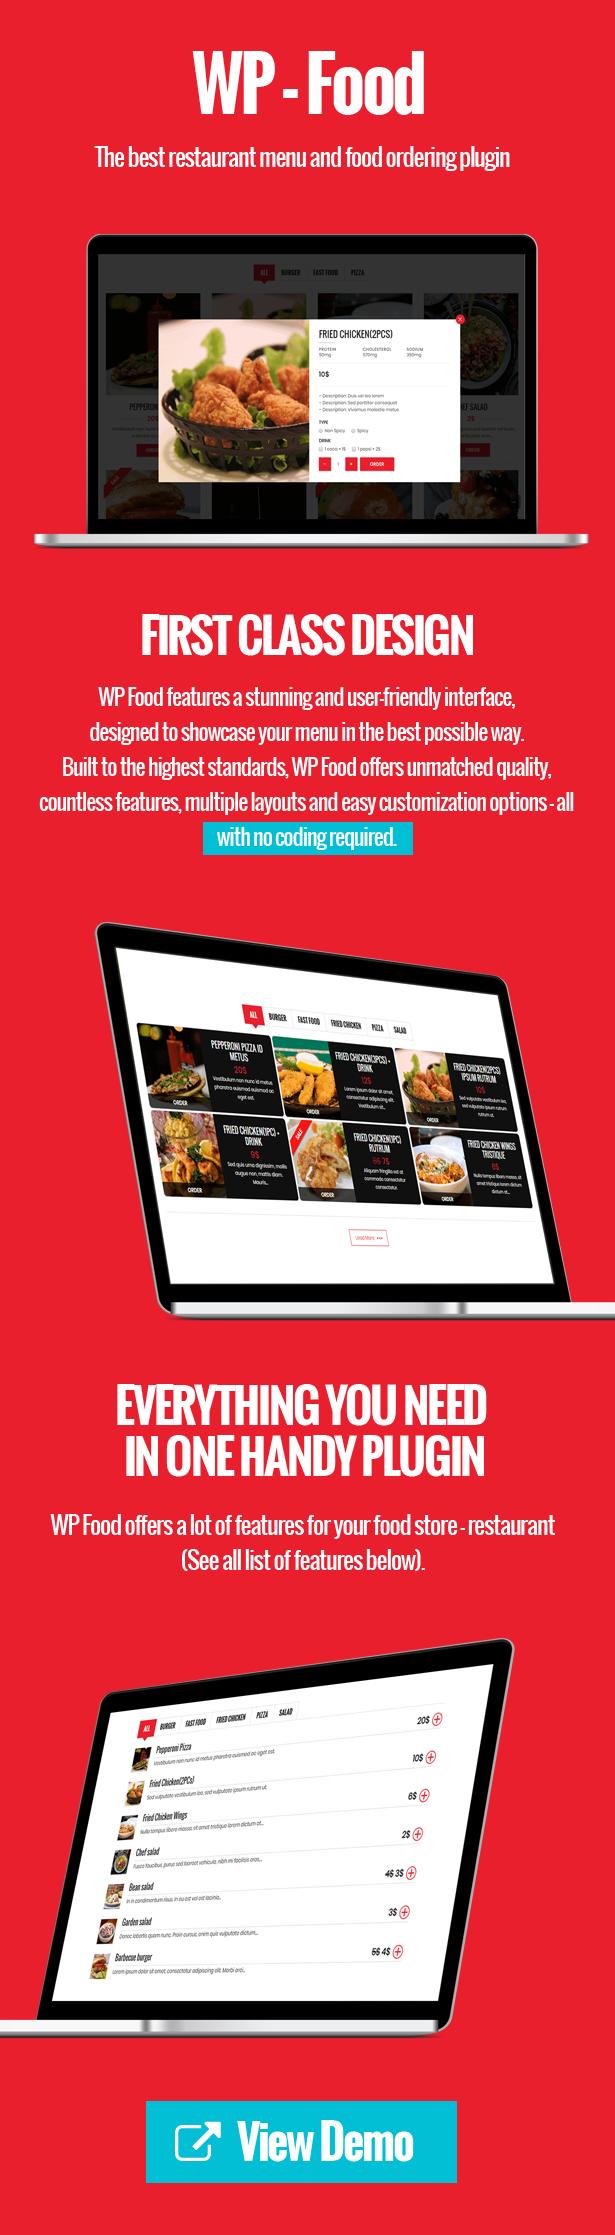 WP Food - Restaurant Menu & Food ordering - 3